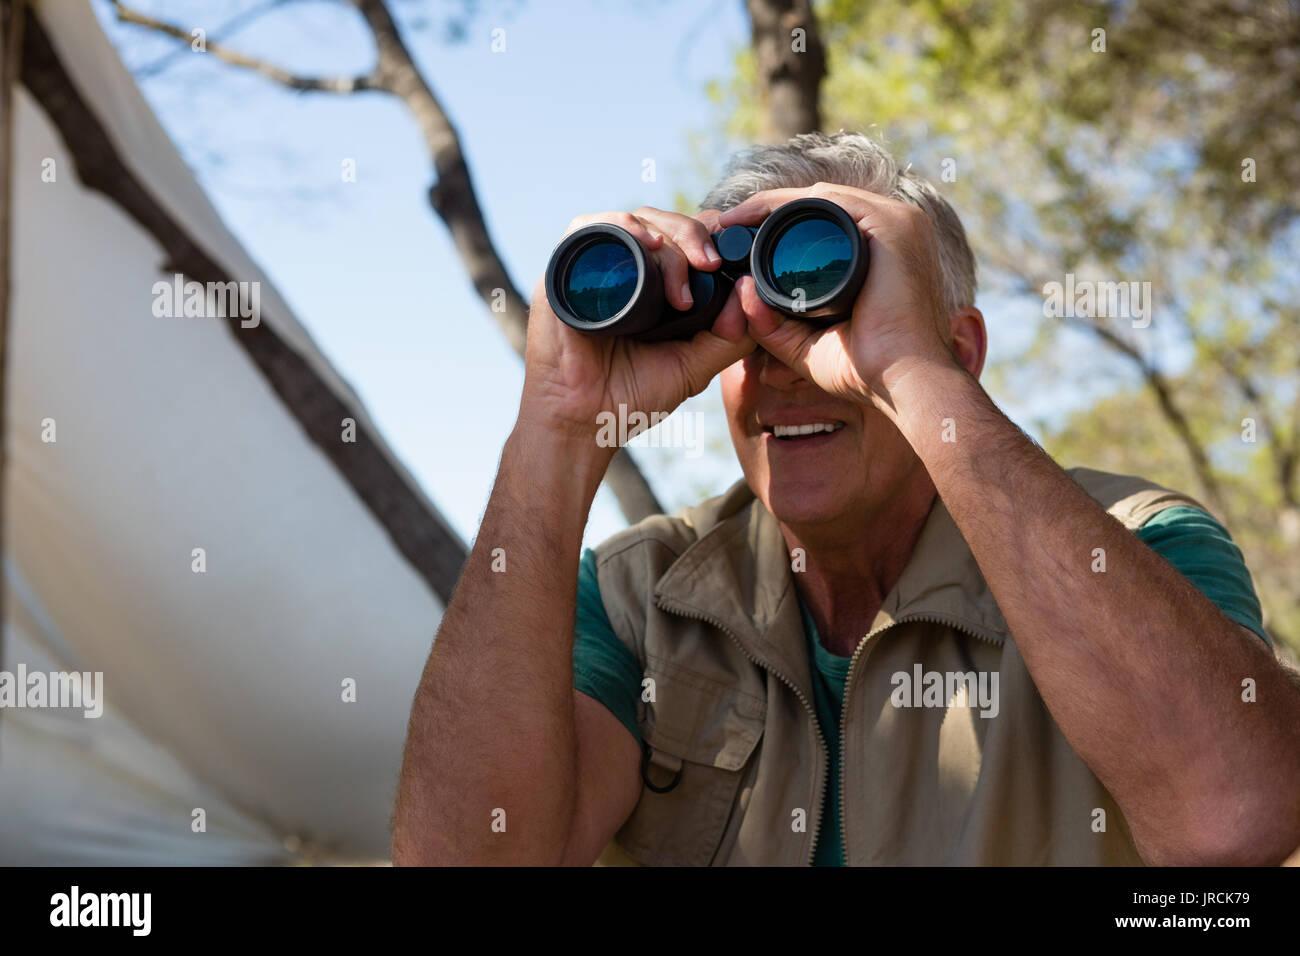 Mature man looking through binocular by tent - Stock Image